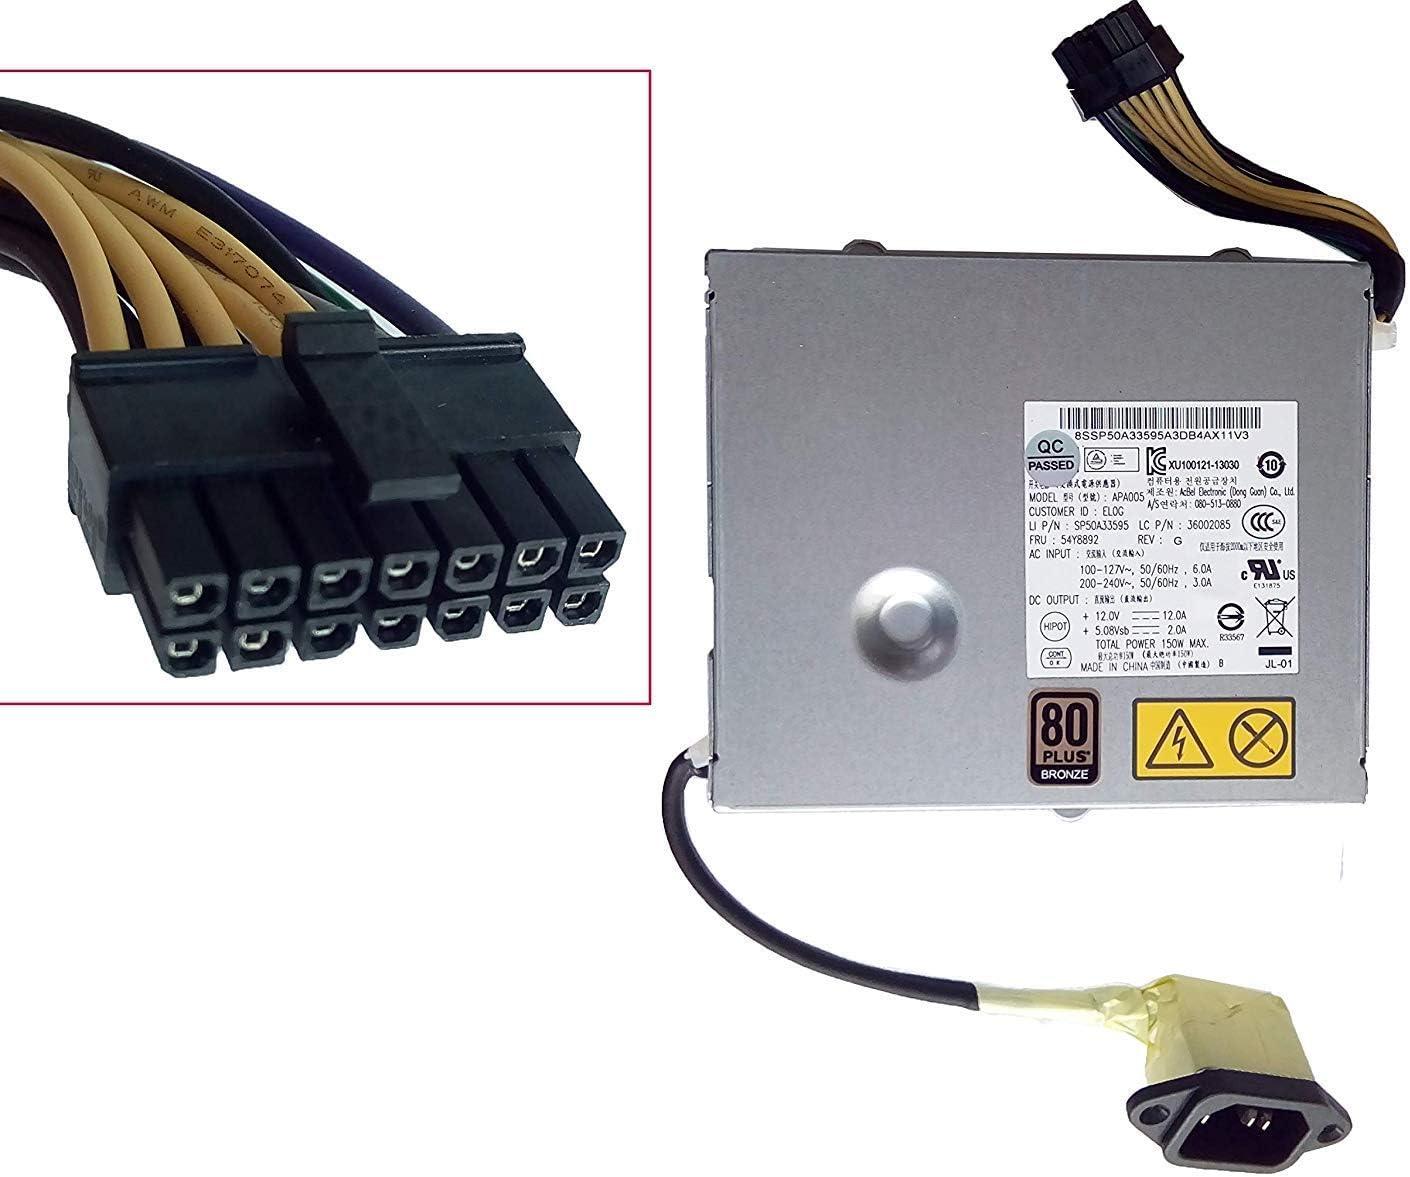 150 Watt Power Supply 54Y8892 for Lenovo ThinkCentre Edge M83 M71Z M72Z M73Z M93z 92z AIO PC P/N 36002086 03T9022 FSP150-20Al CHKF1502-3B ompatible Mcbel APA005 (Renewed)